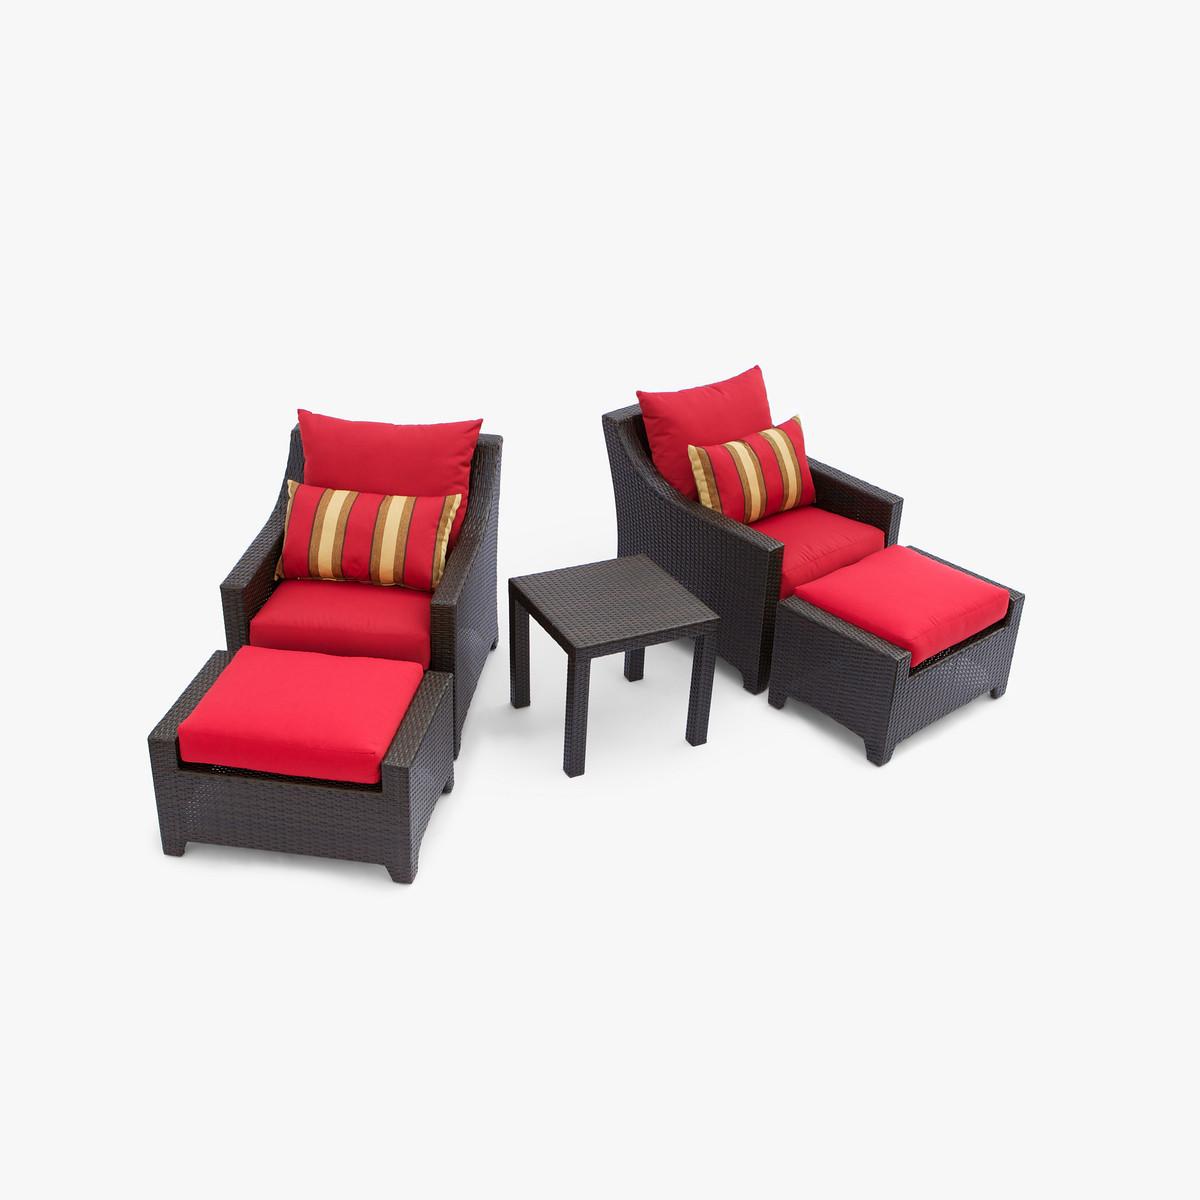 Furniture Living Room Furniture Club Chair Cast Aluminum Club